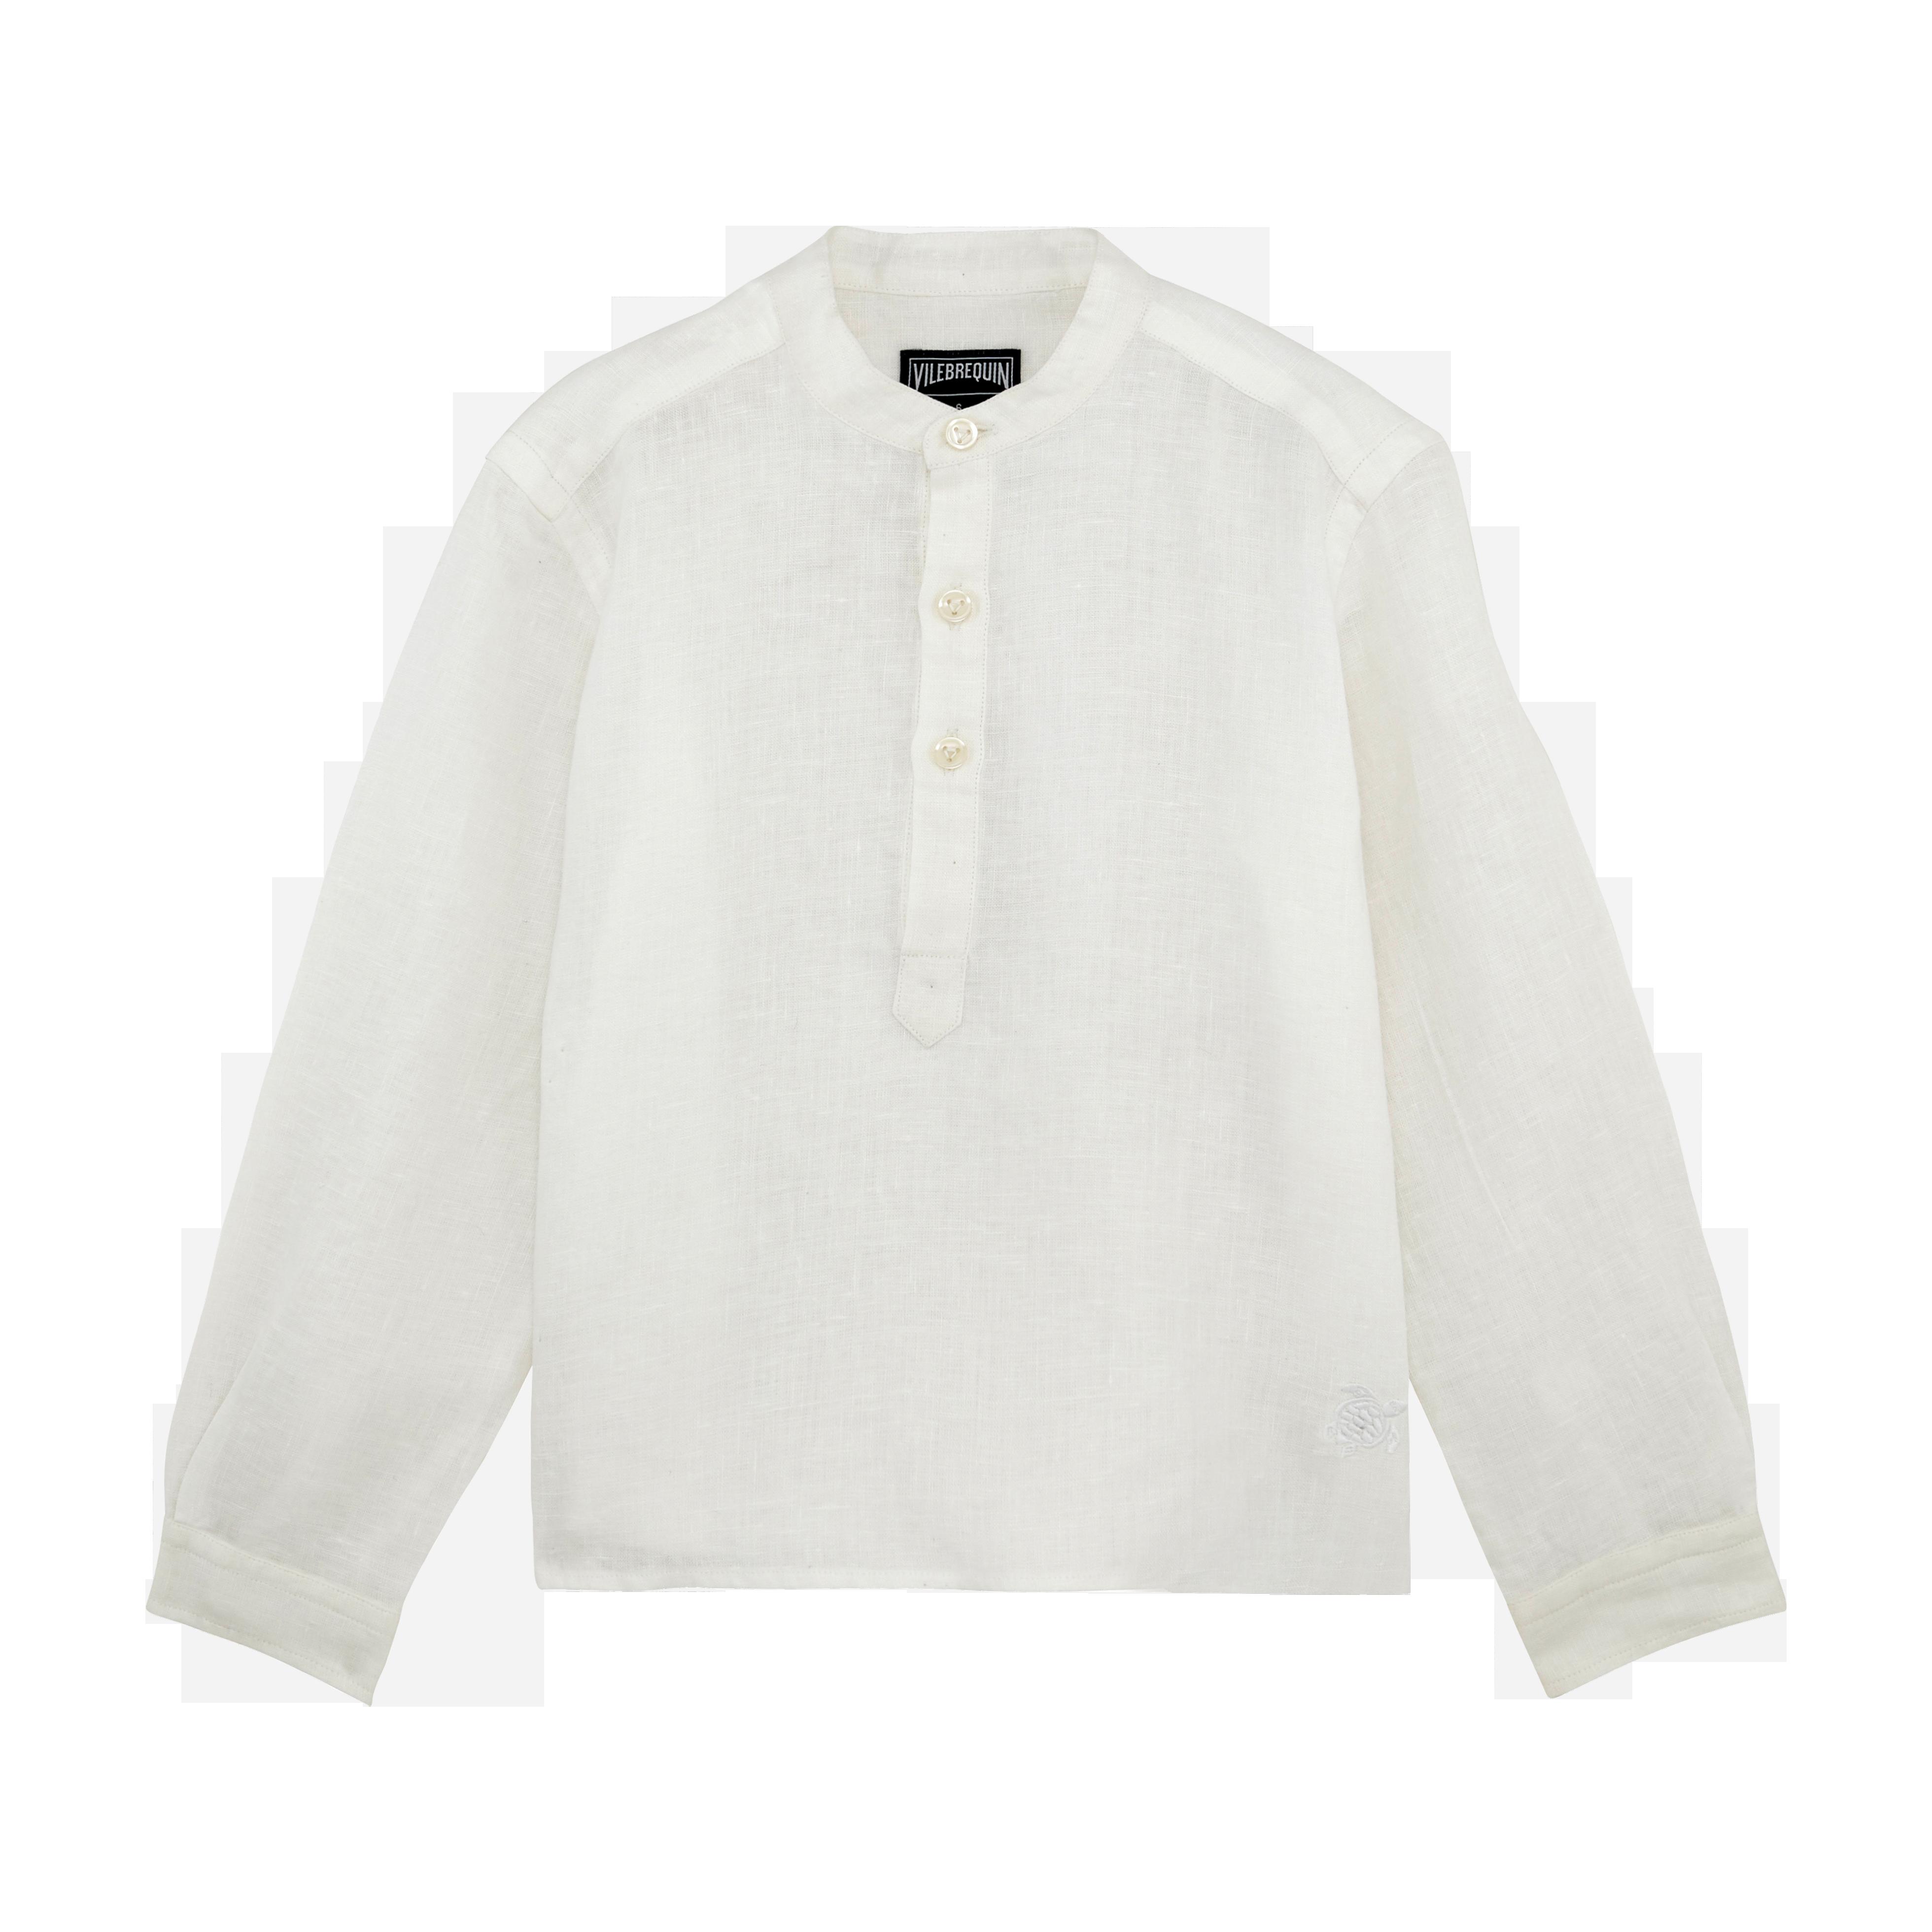 VILEBREQUIN | Boys Ready to Wear - Boys Linen Shirt Solid - SHIRT - JOMAO - White - 14 - Vilebrequin | Goxip